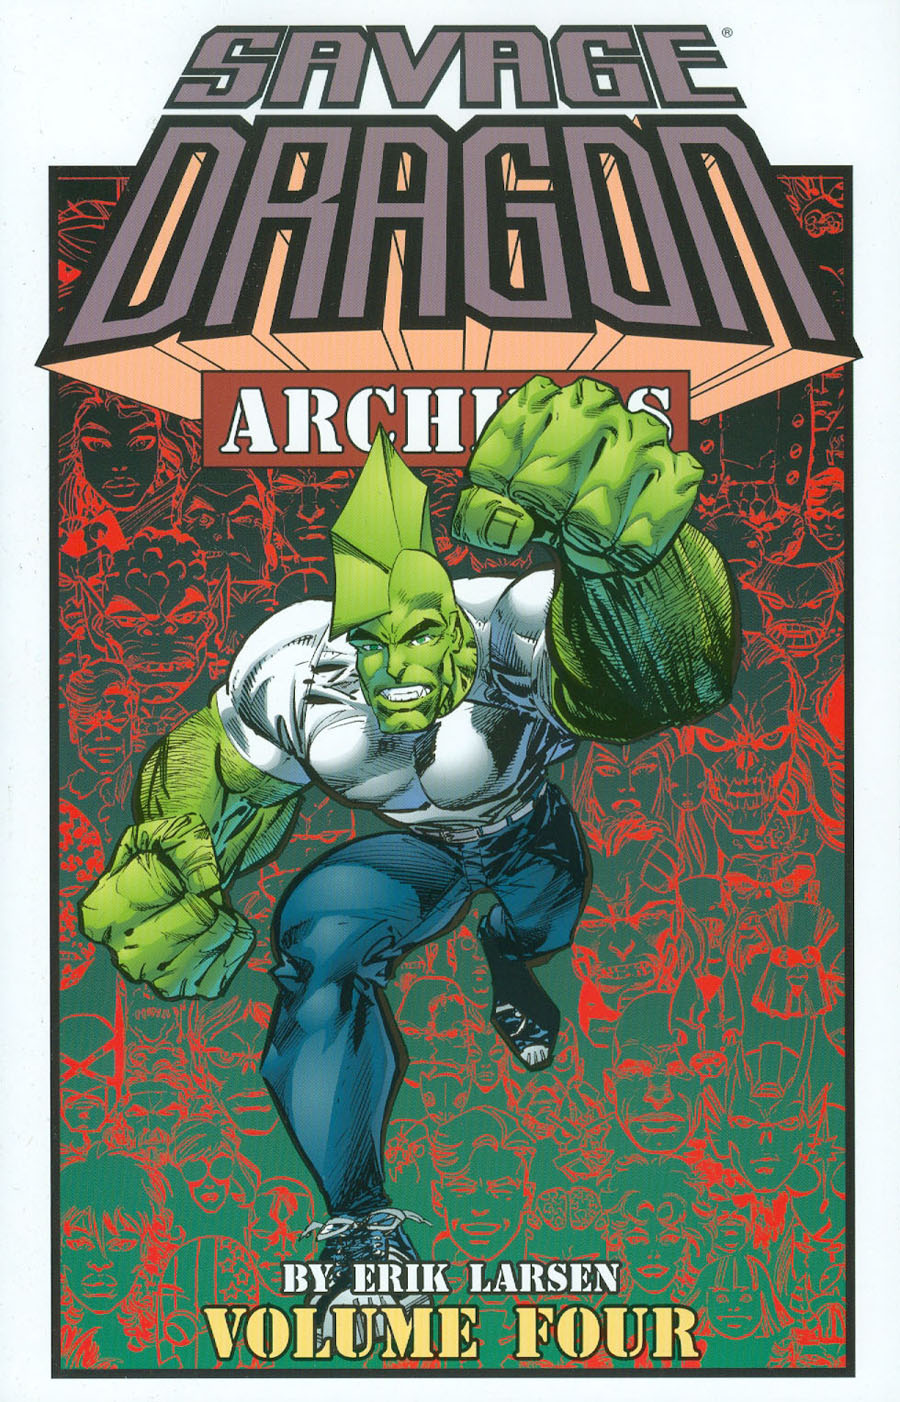 Savage Dragon Archives Vol 4 TP